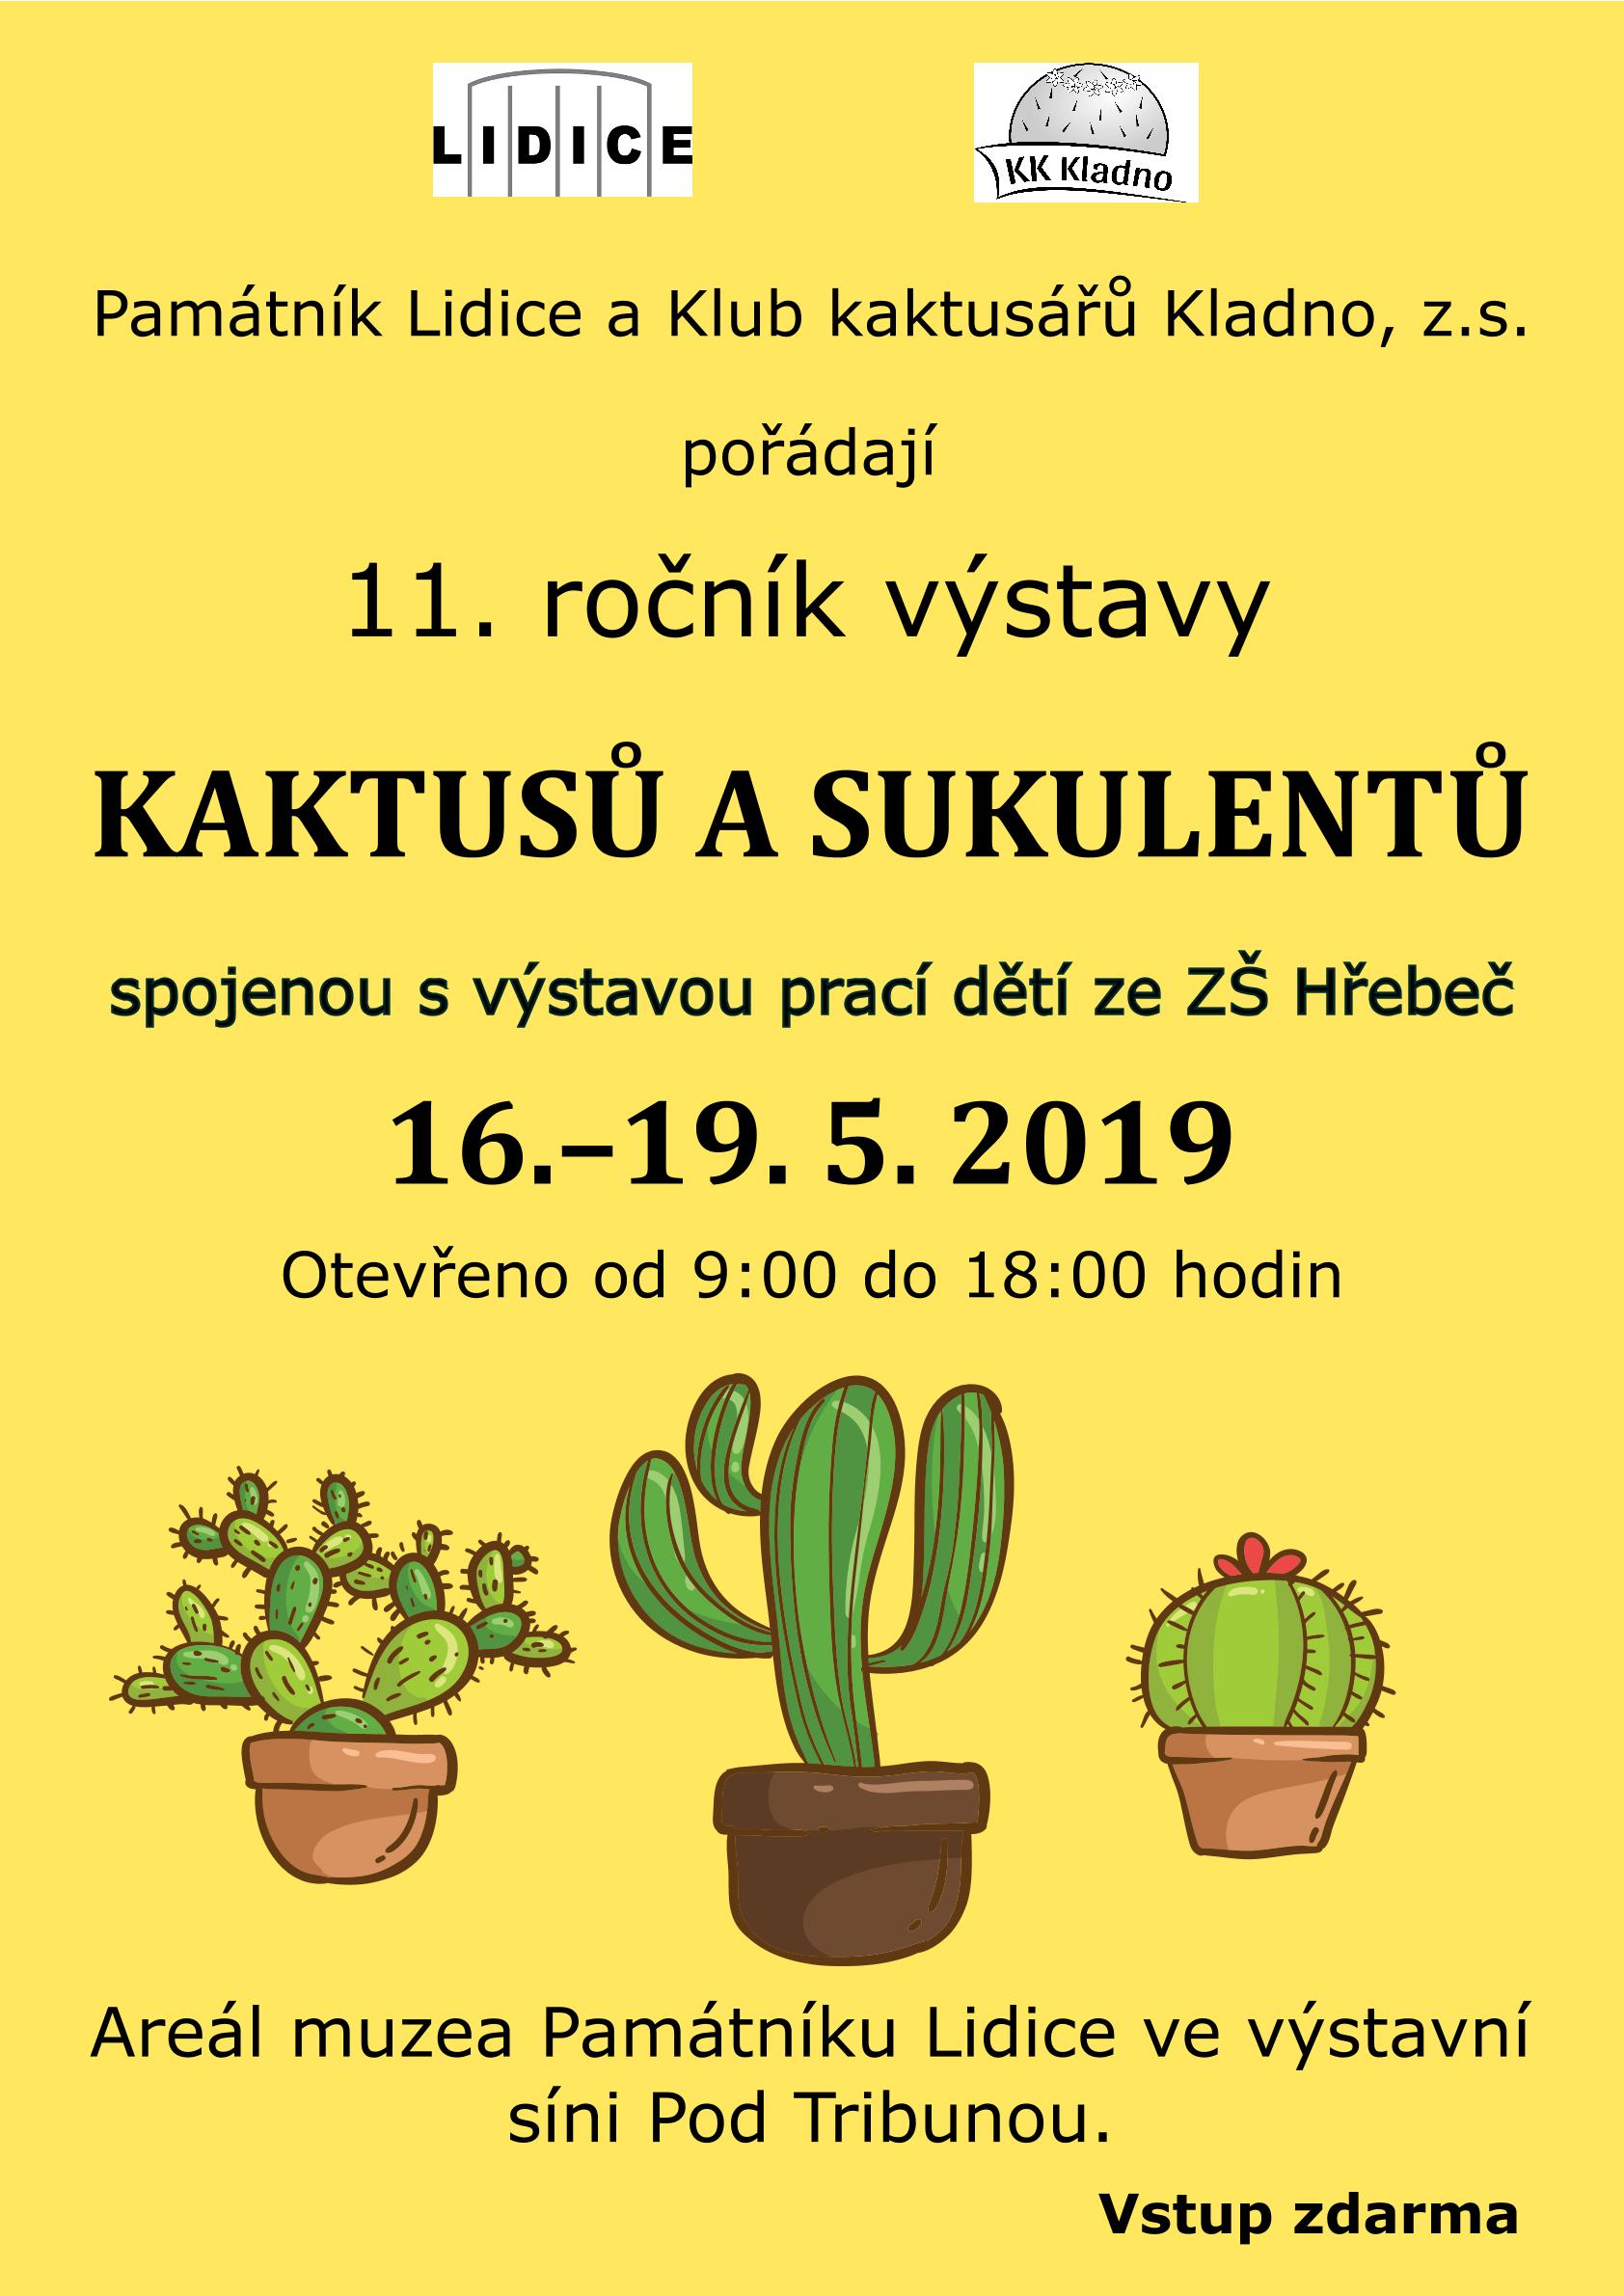 20190430 Plakat lidice 2019